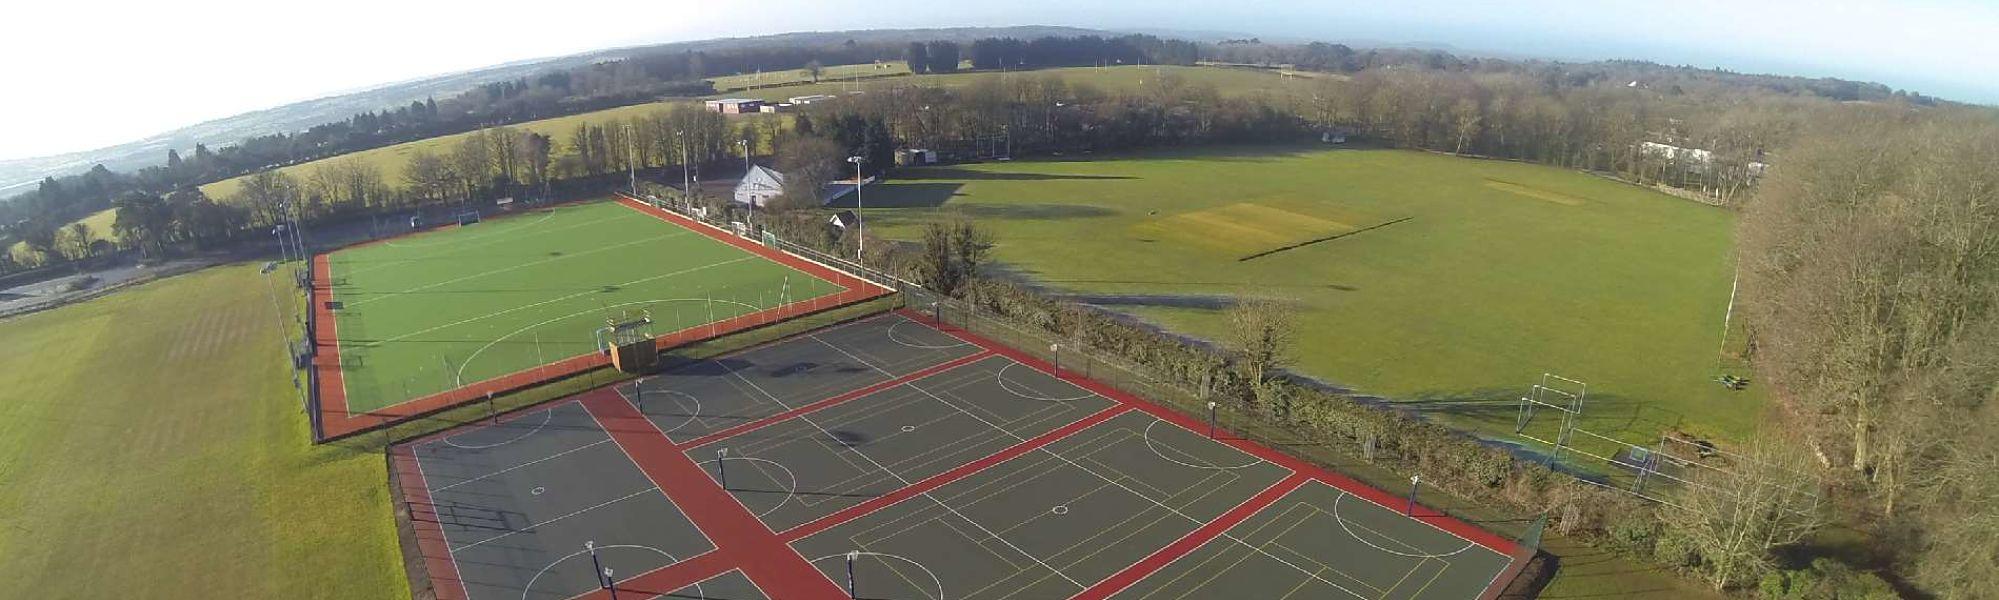 BGS. Bristol Grammar School. Sports